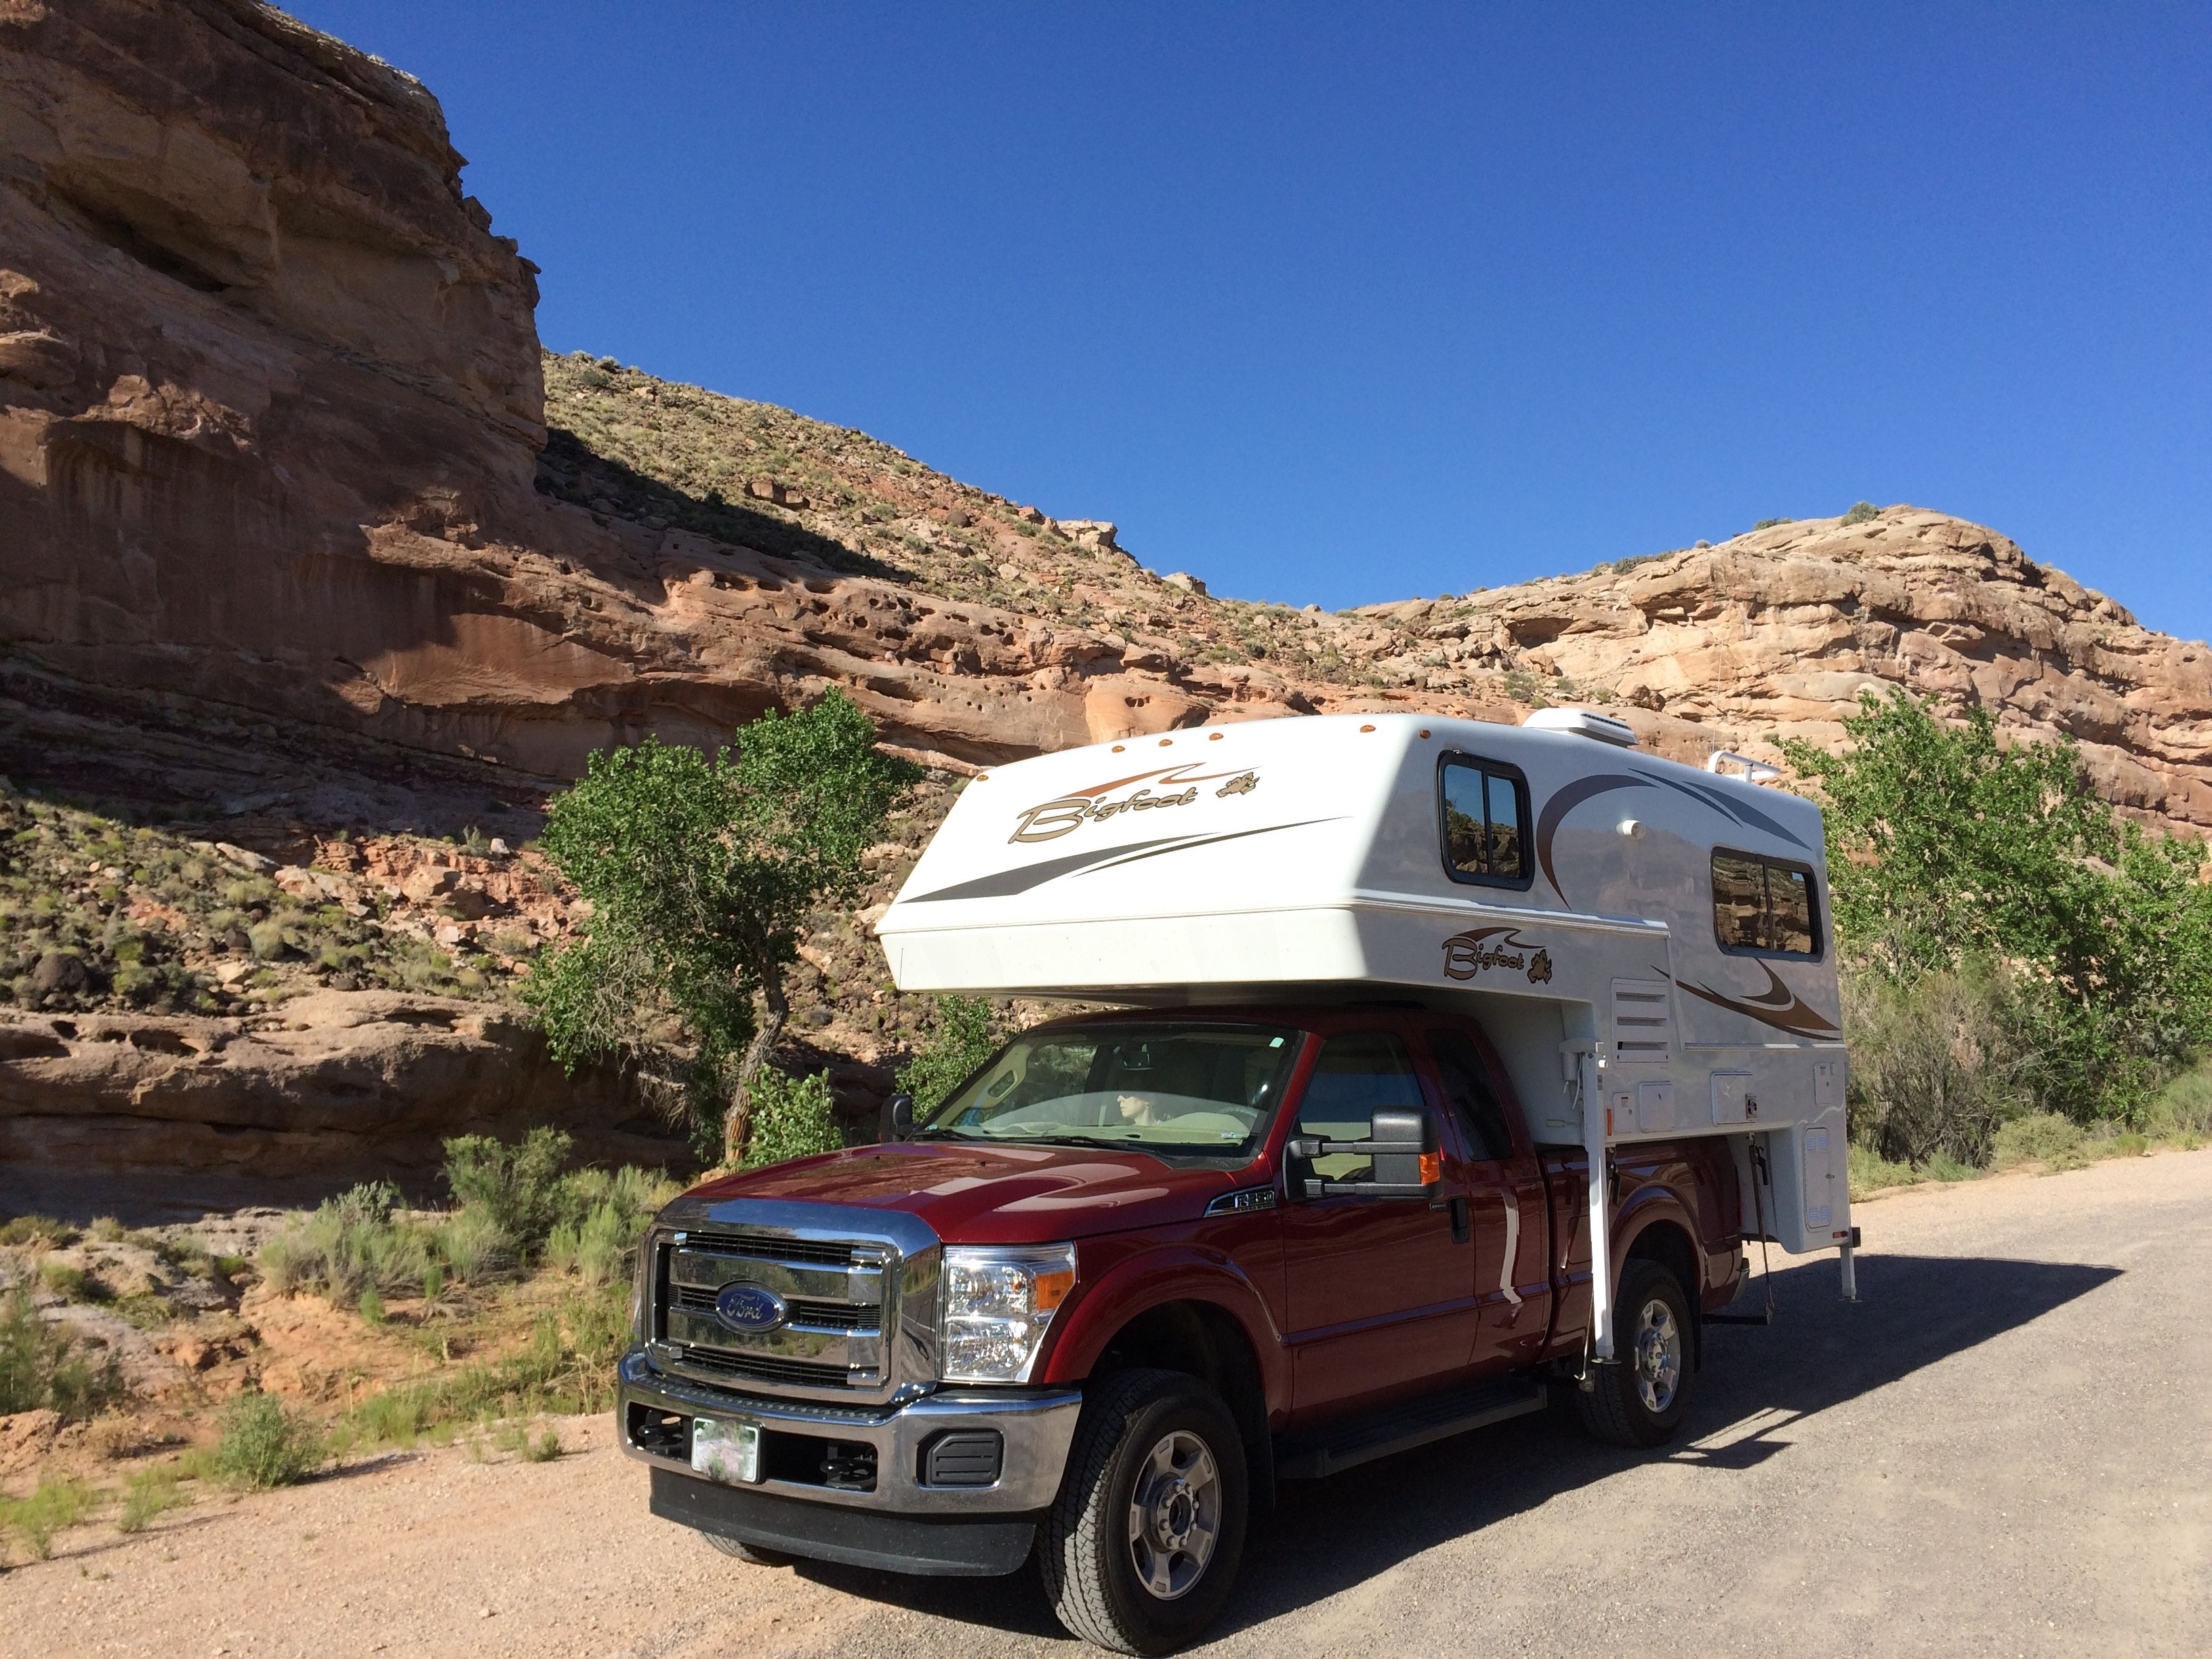 Bigfoot 25C9 4SB Review - Truck Camper Adventure | truck